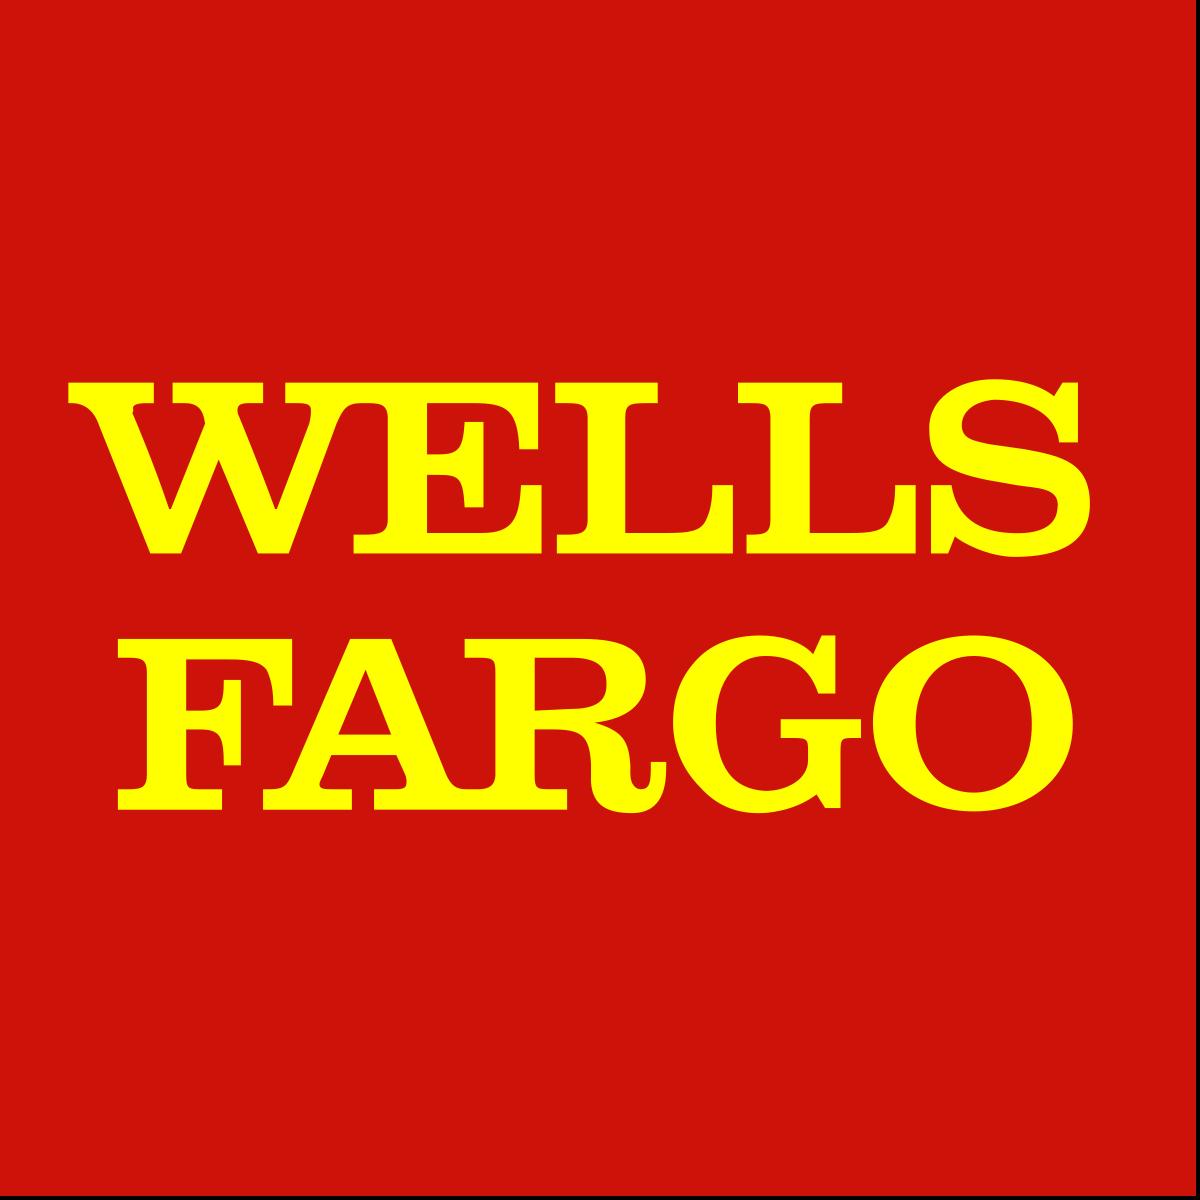 Miramar Pembroke Pines Chamber of Commerce Chairman Circle-Wells-Fargo.png